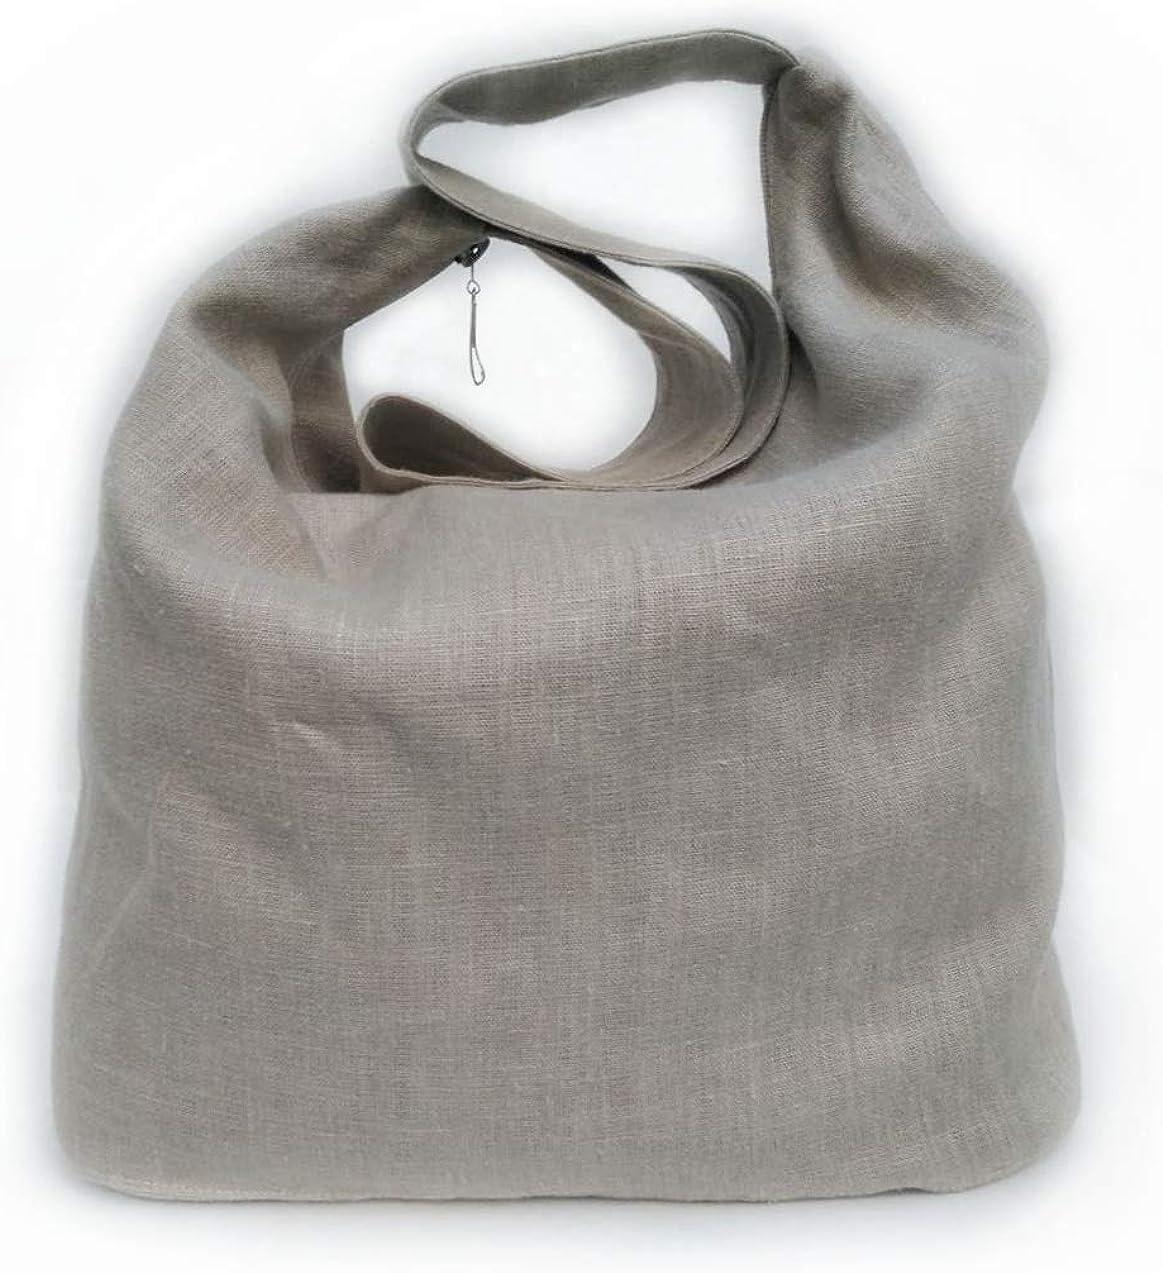 Hobo Shoulder bag, Canvas Crossbody bags, Hobo bags crossbody, tote bag women, Tote bag women, boho bags crossbody